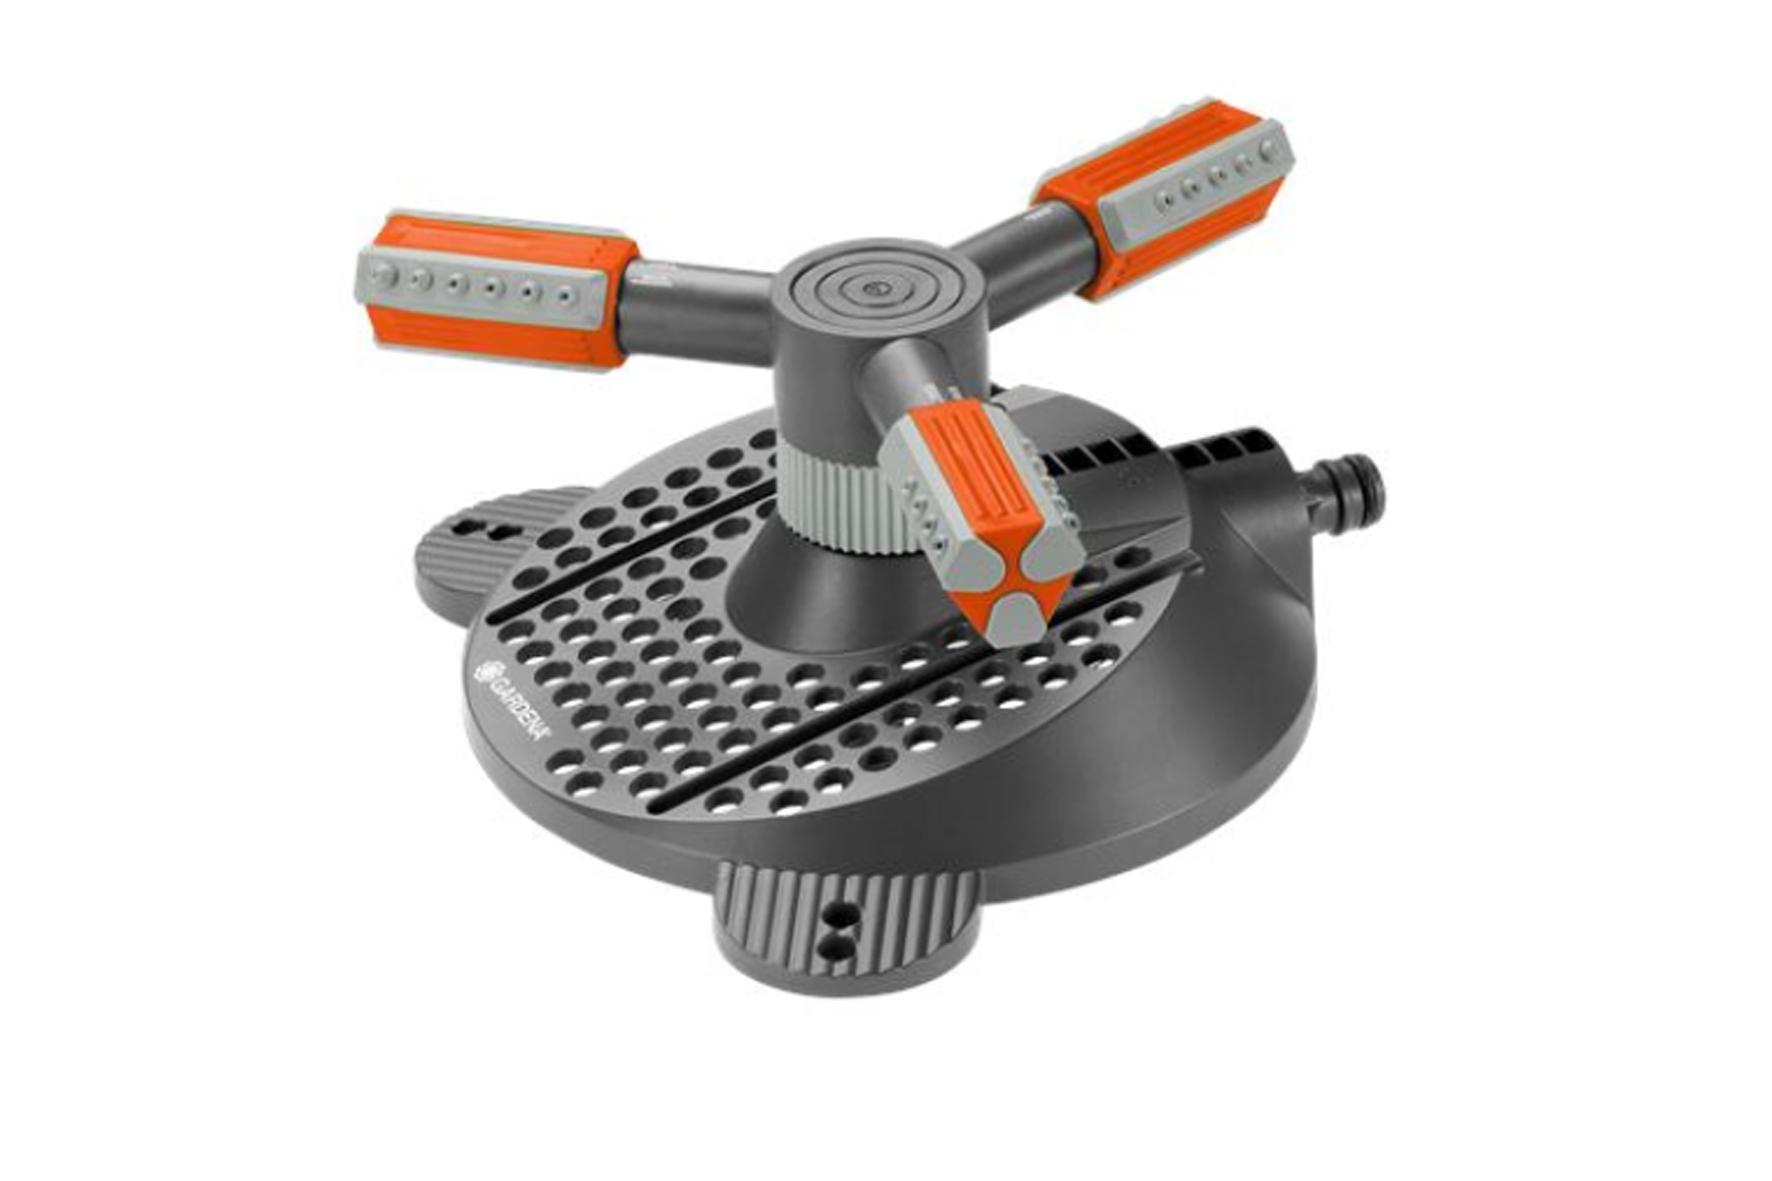 Arroseur rotatif mambo gardena achat en ligne ou dans notre magasin - Arroseur rotatif grande surface ...